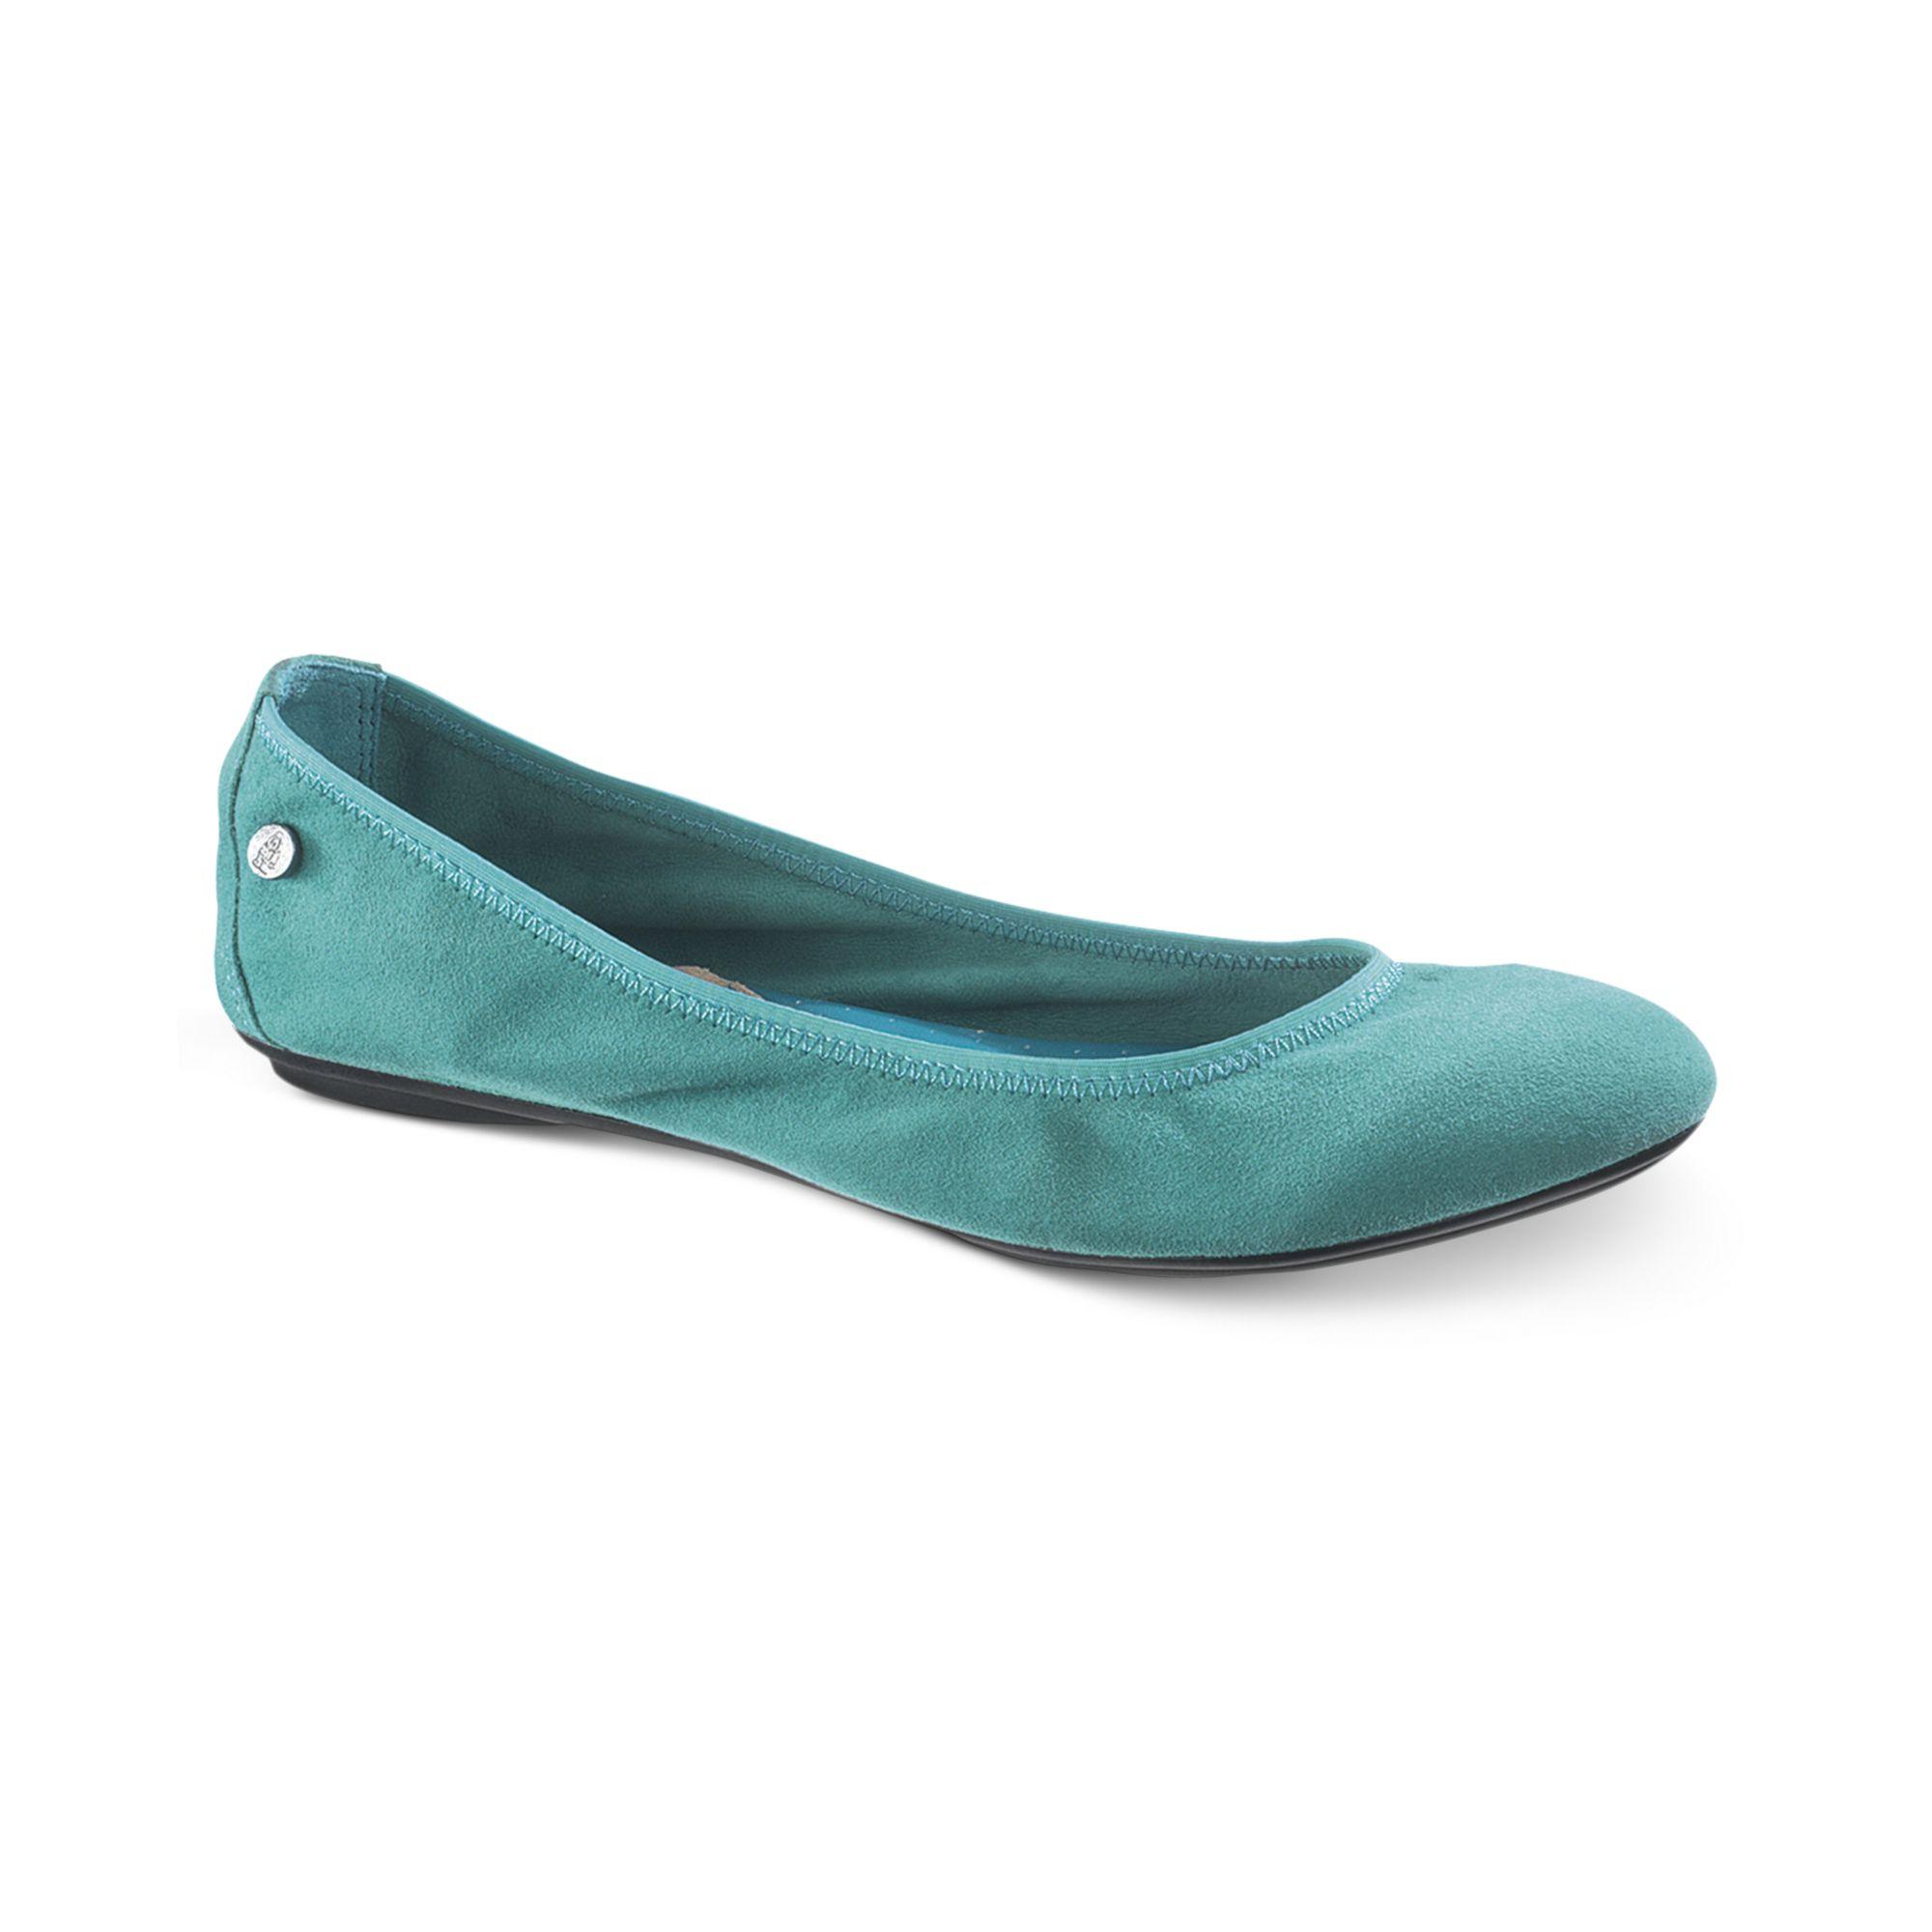 fce8a057ba8 Lyst - Hush Puppies Womens Chaste Ballet Flats in Blue